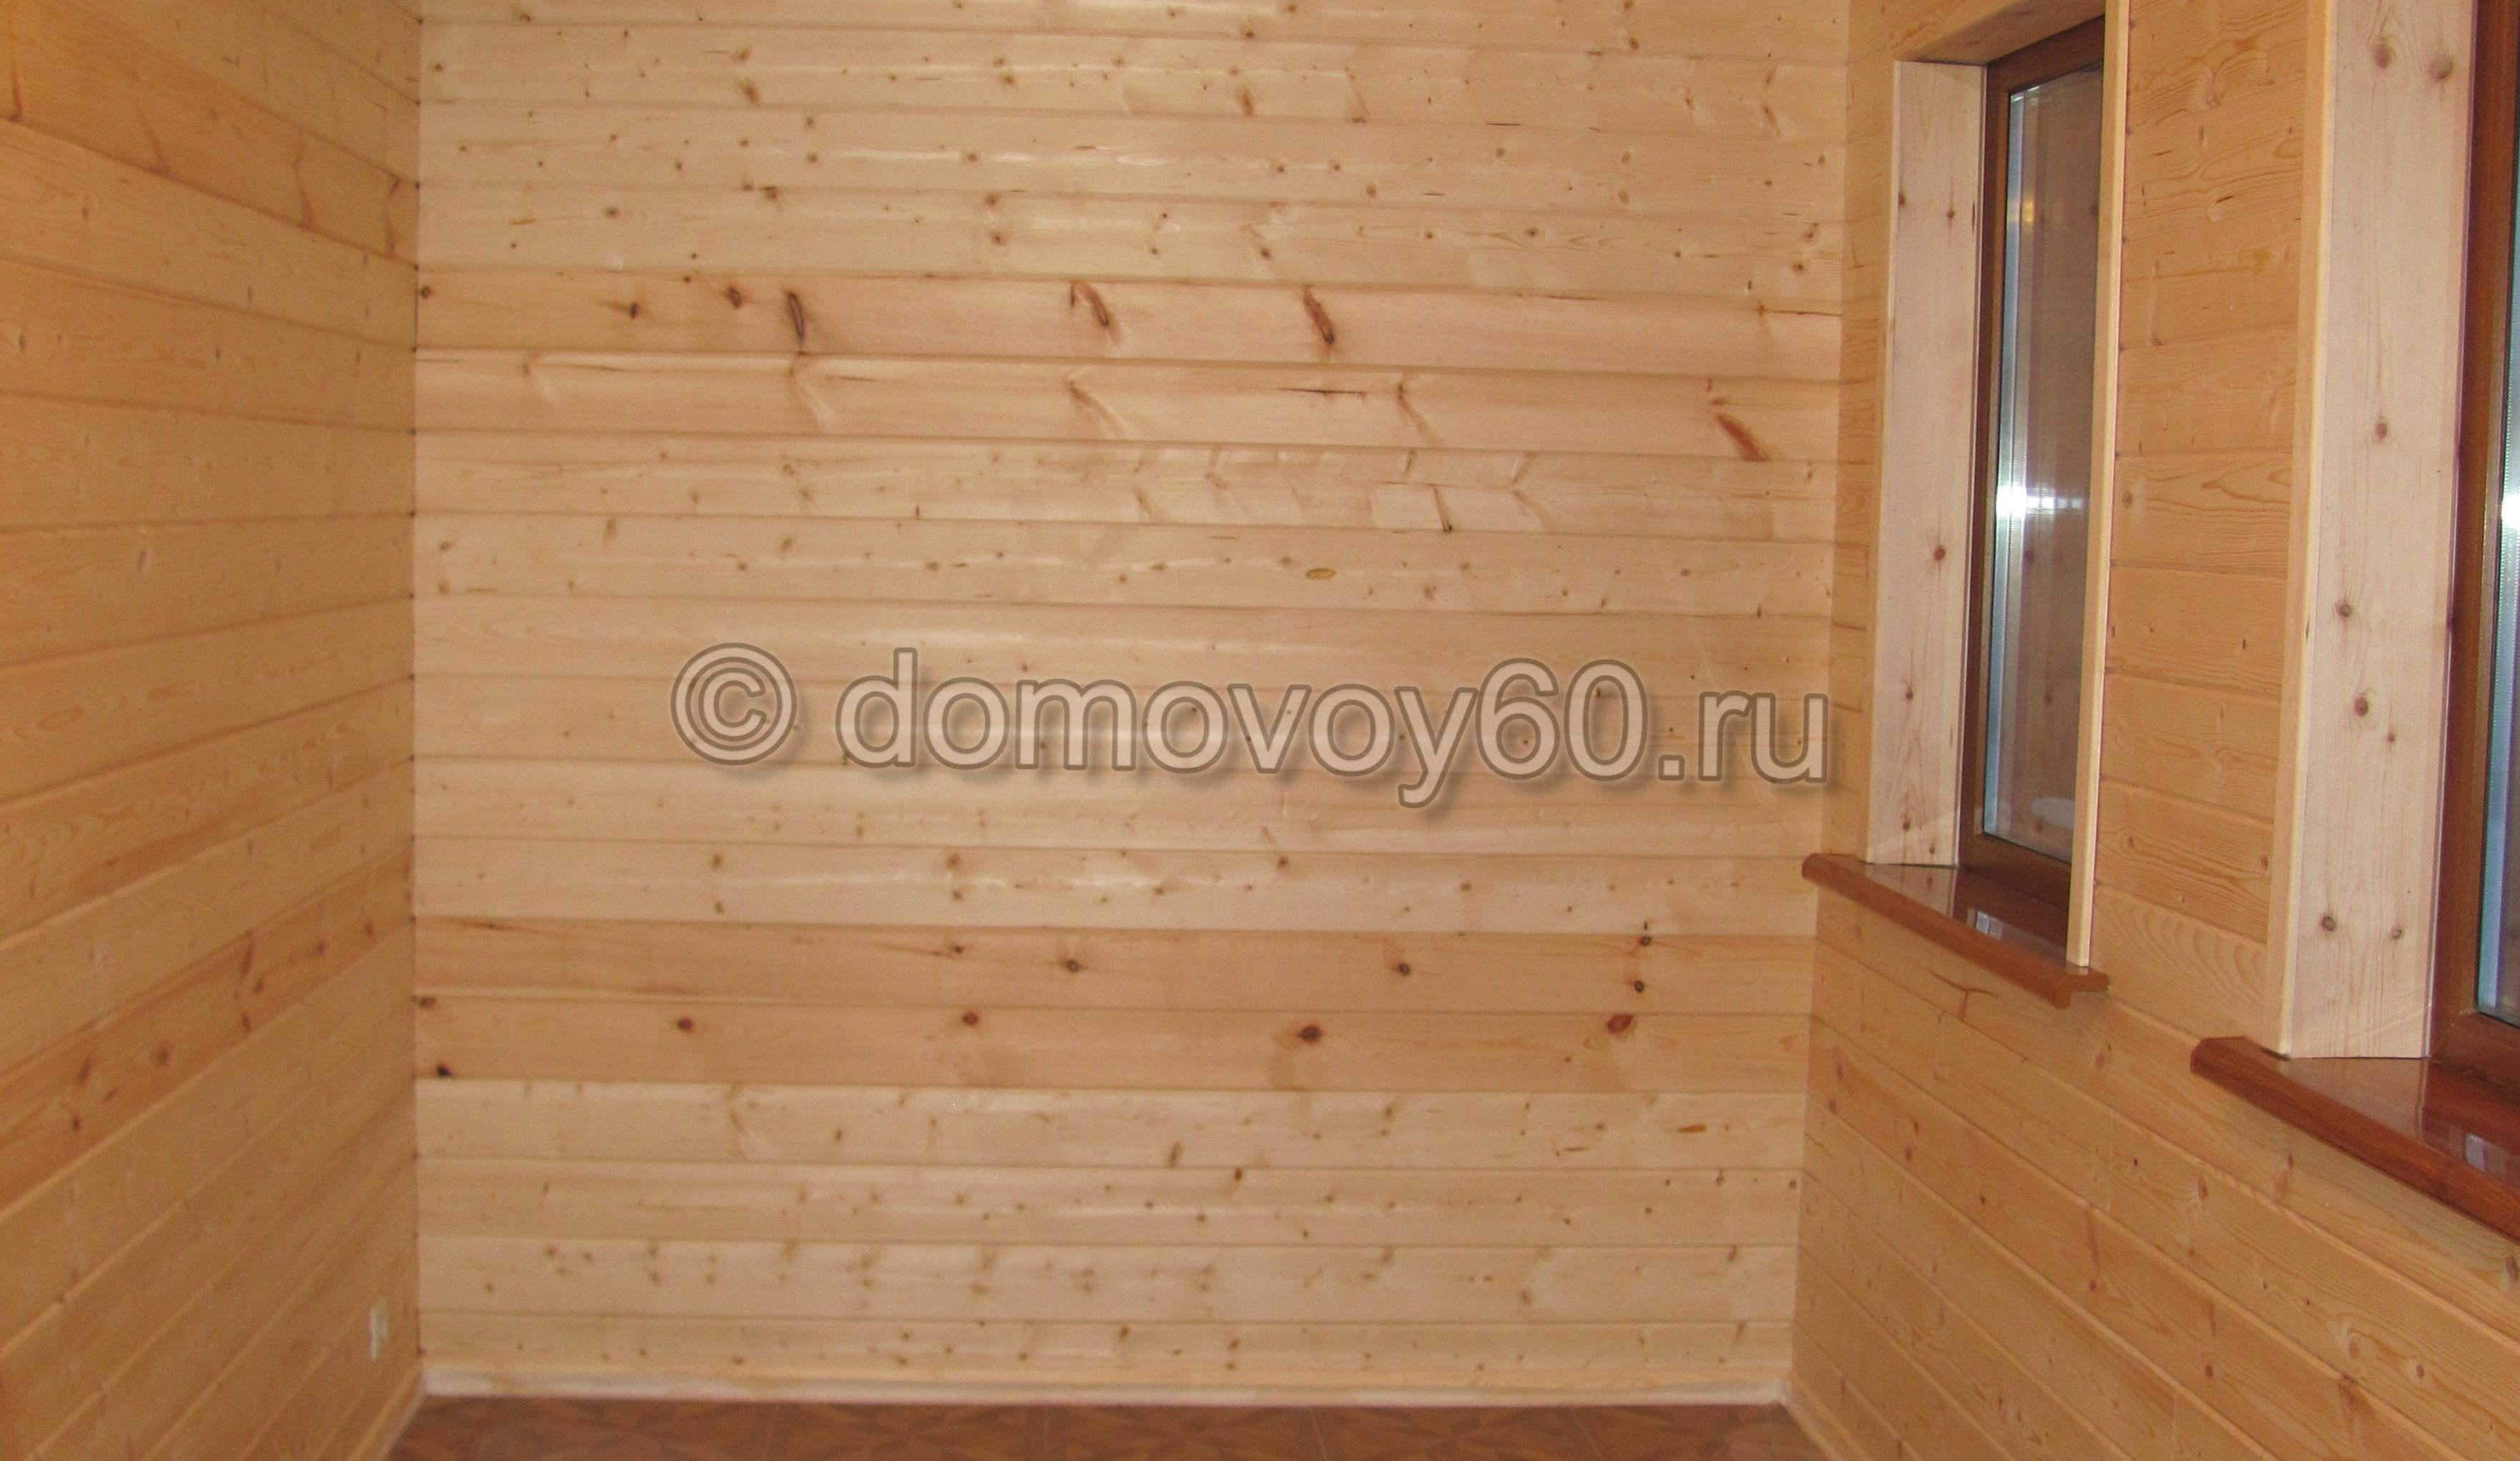 domovoy60-056